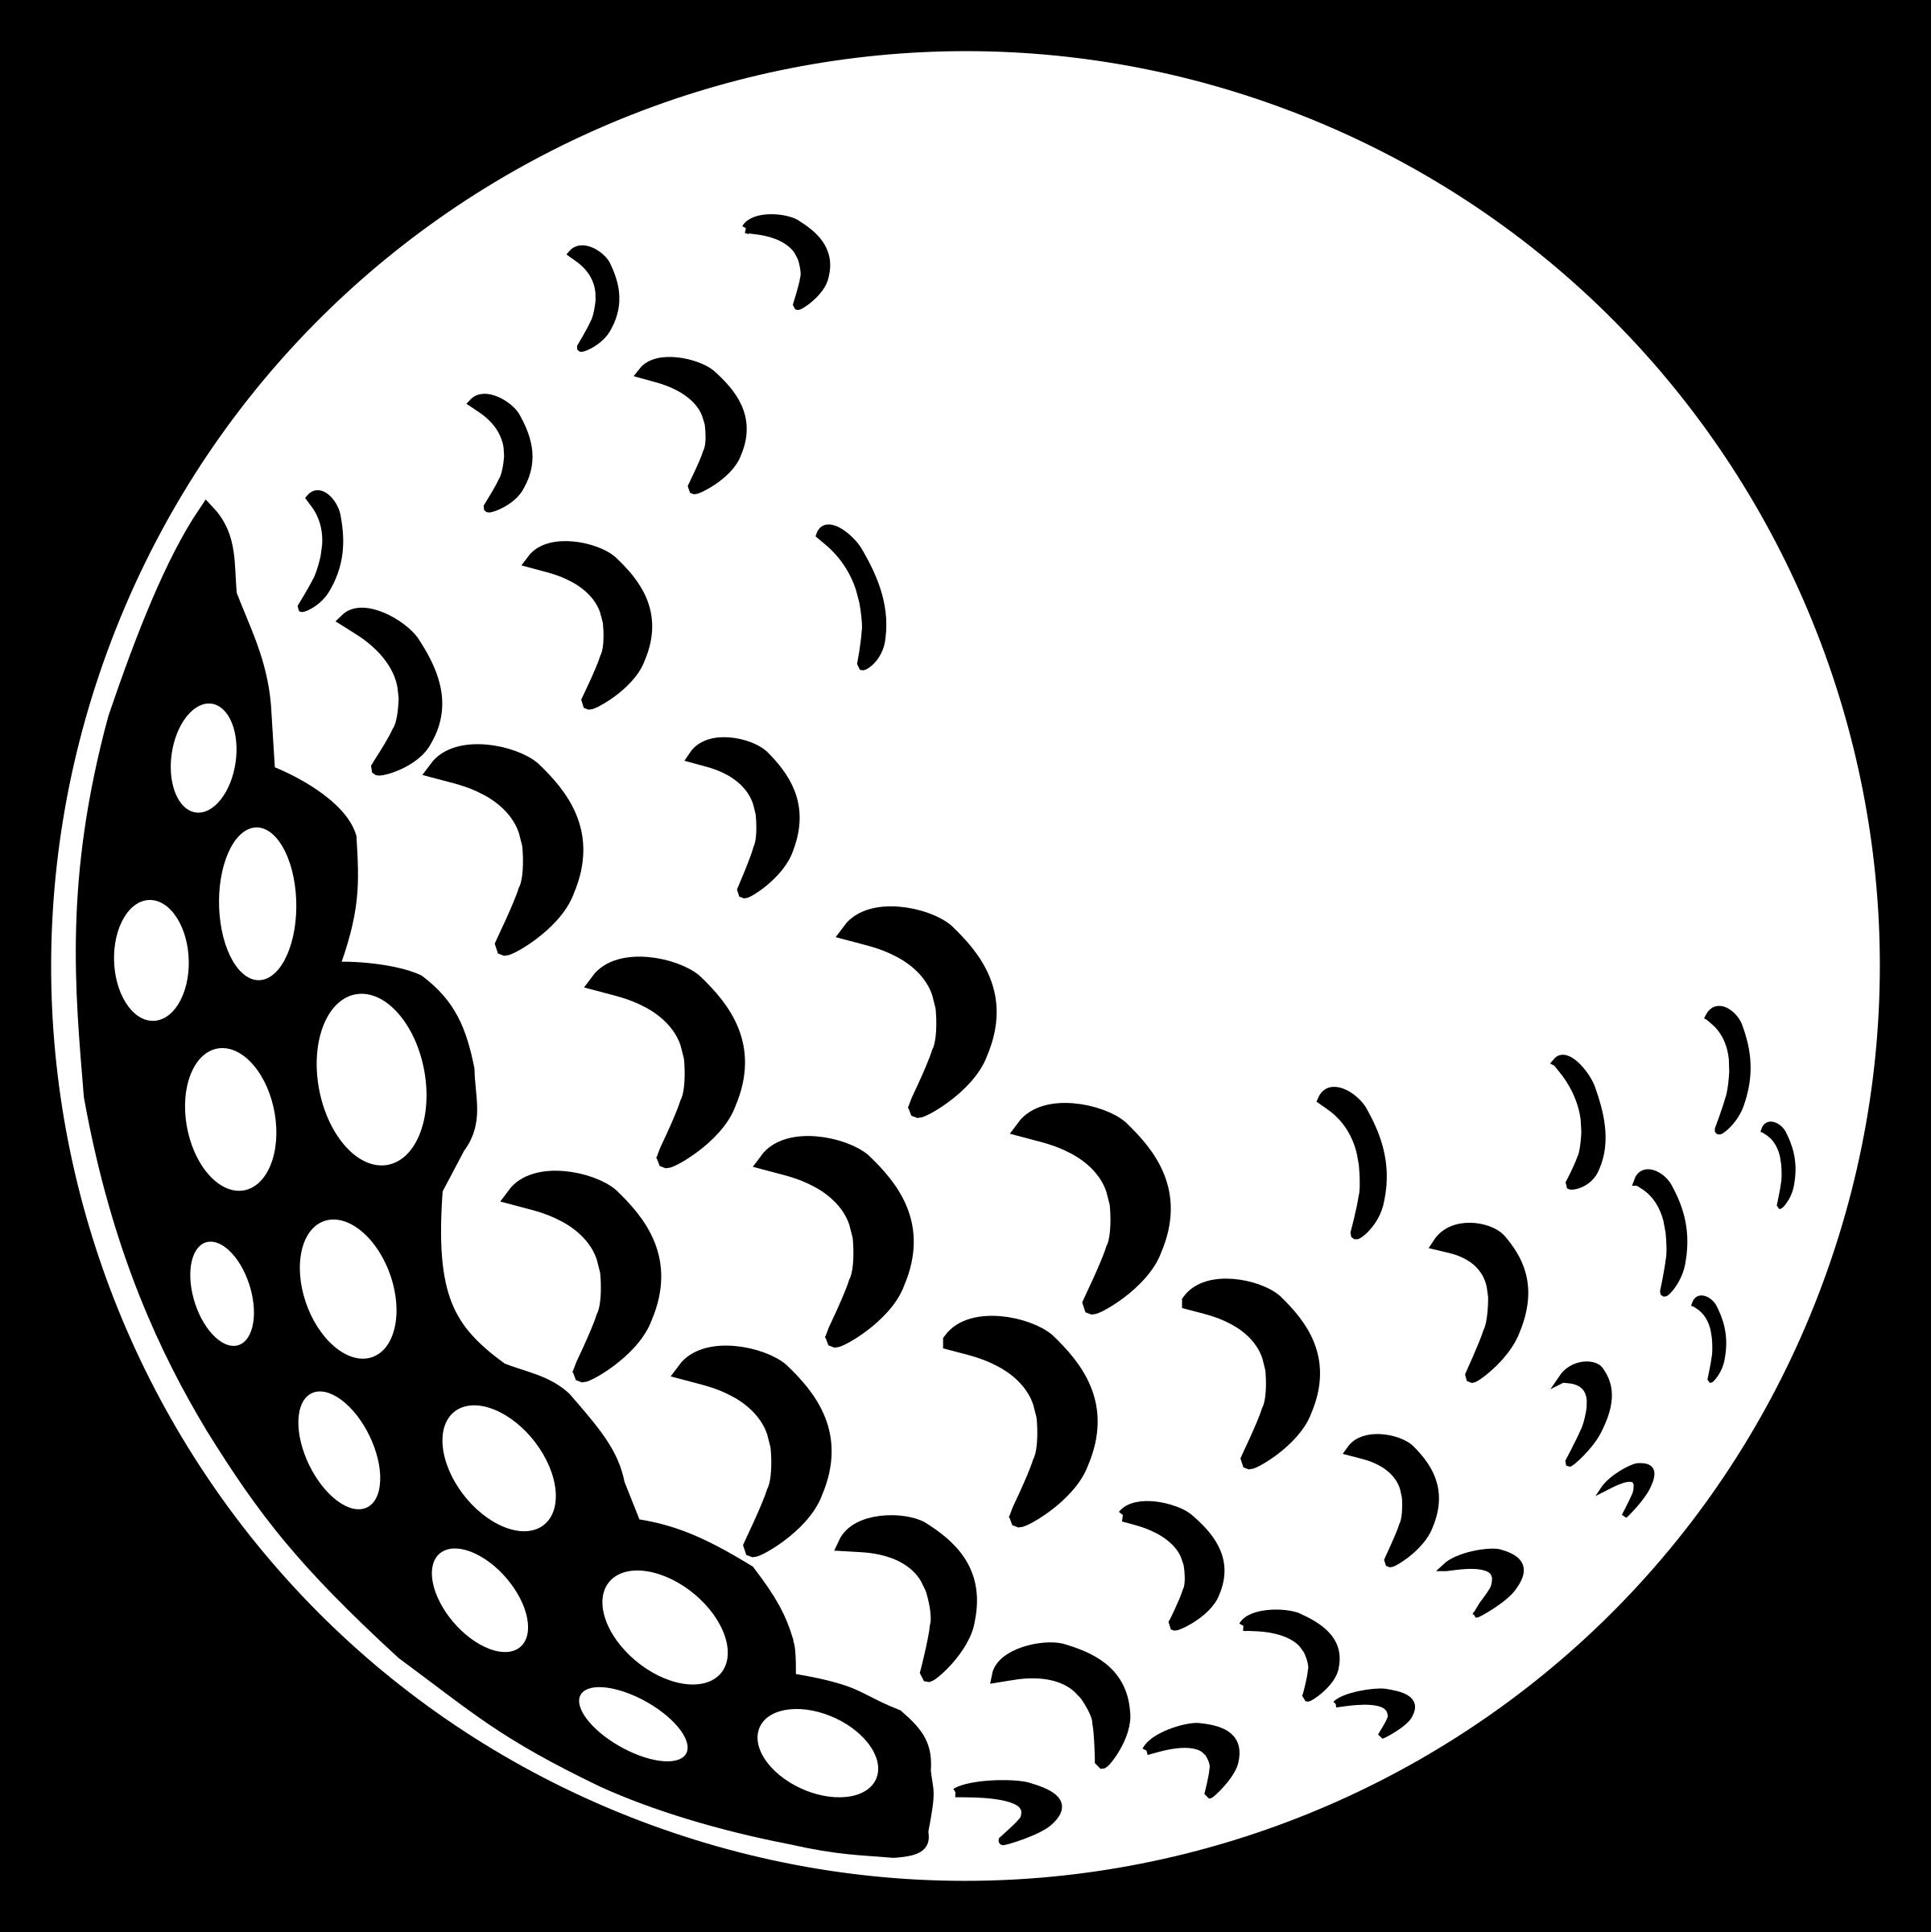 Golfer clipart svg. Golf ball big image